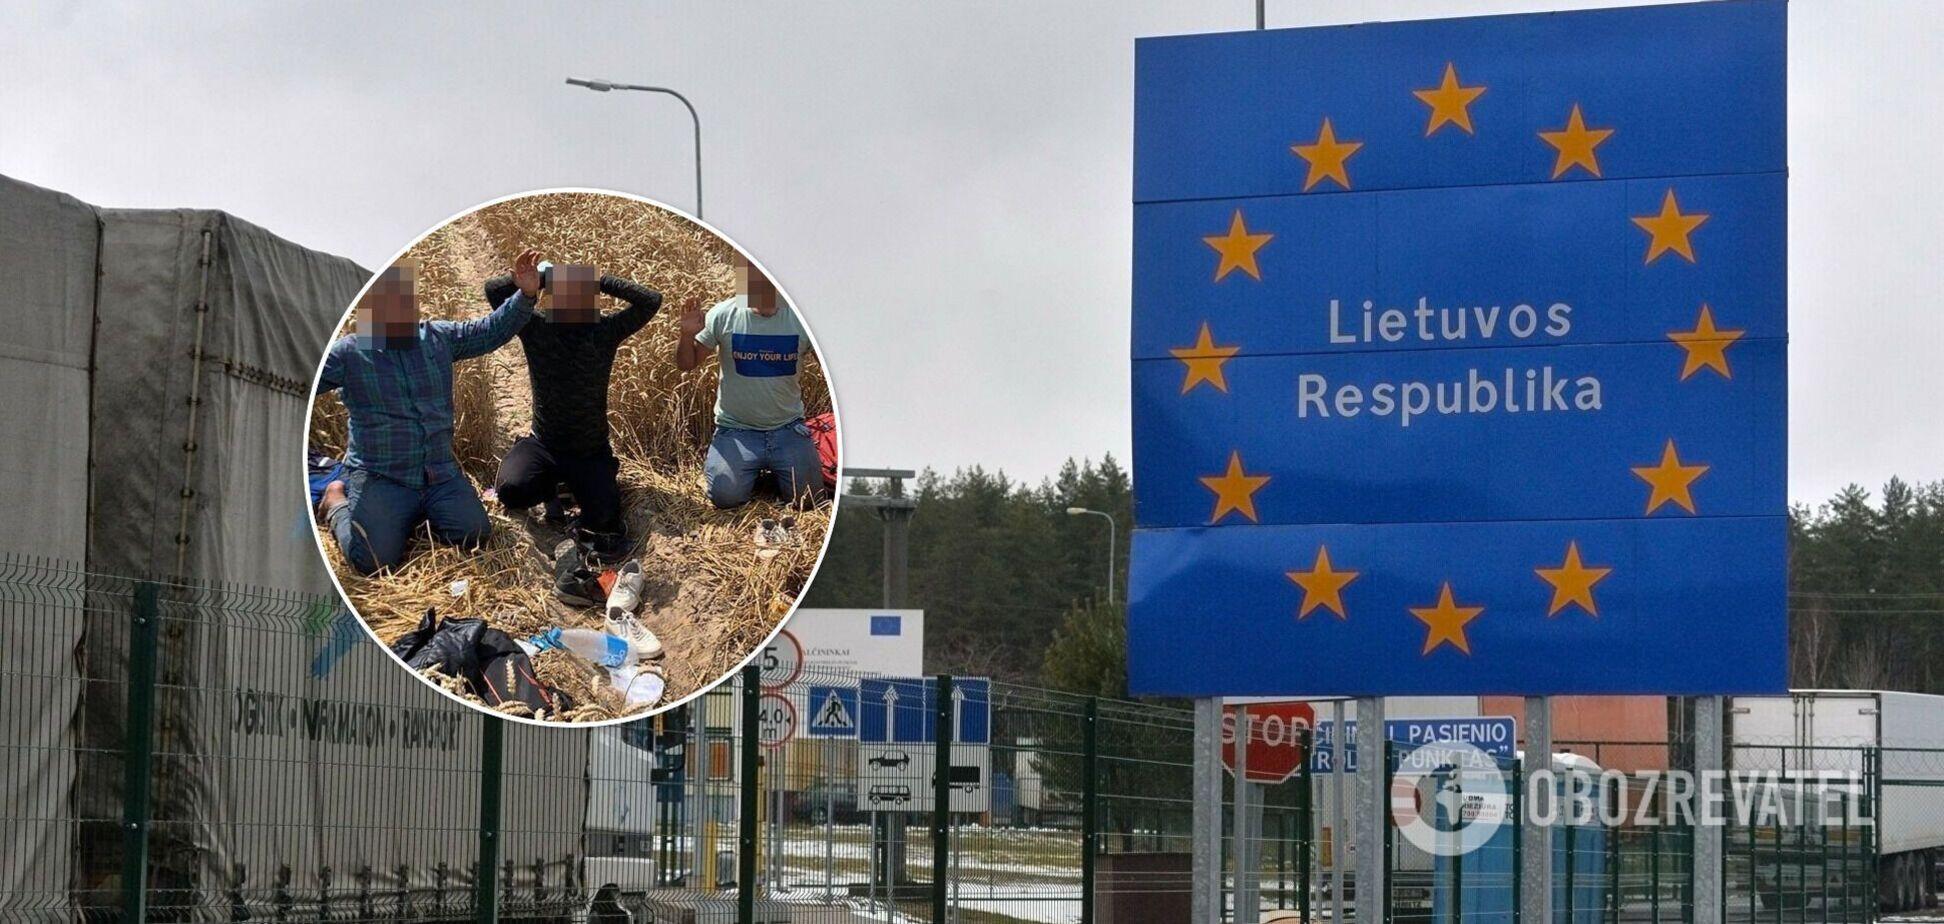 В Литве задержали рекордное количество нелегалов из Беларуси